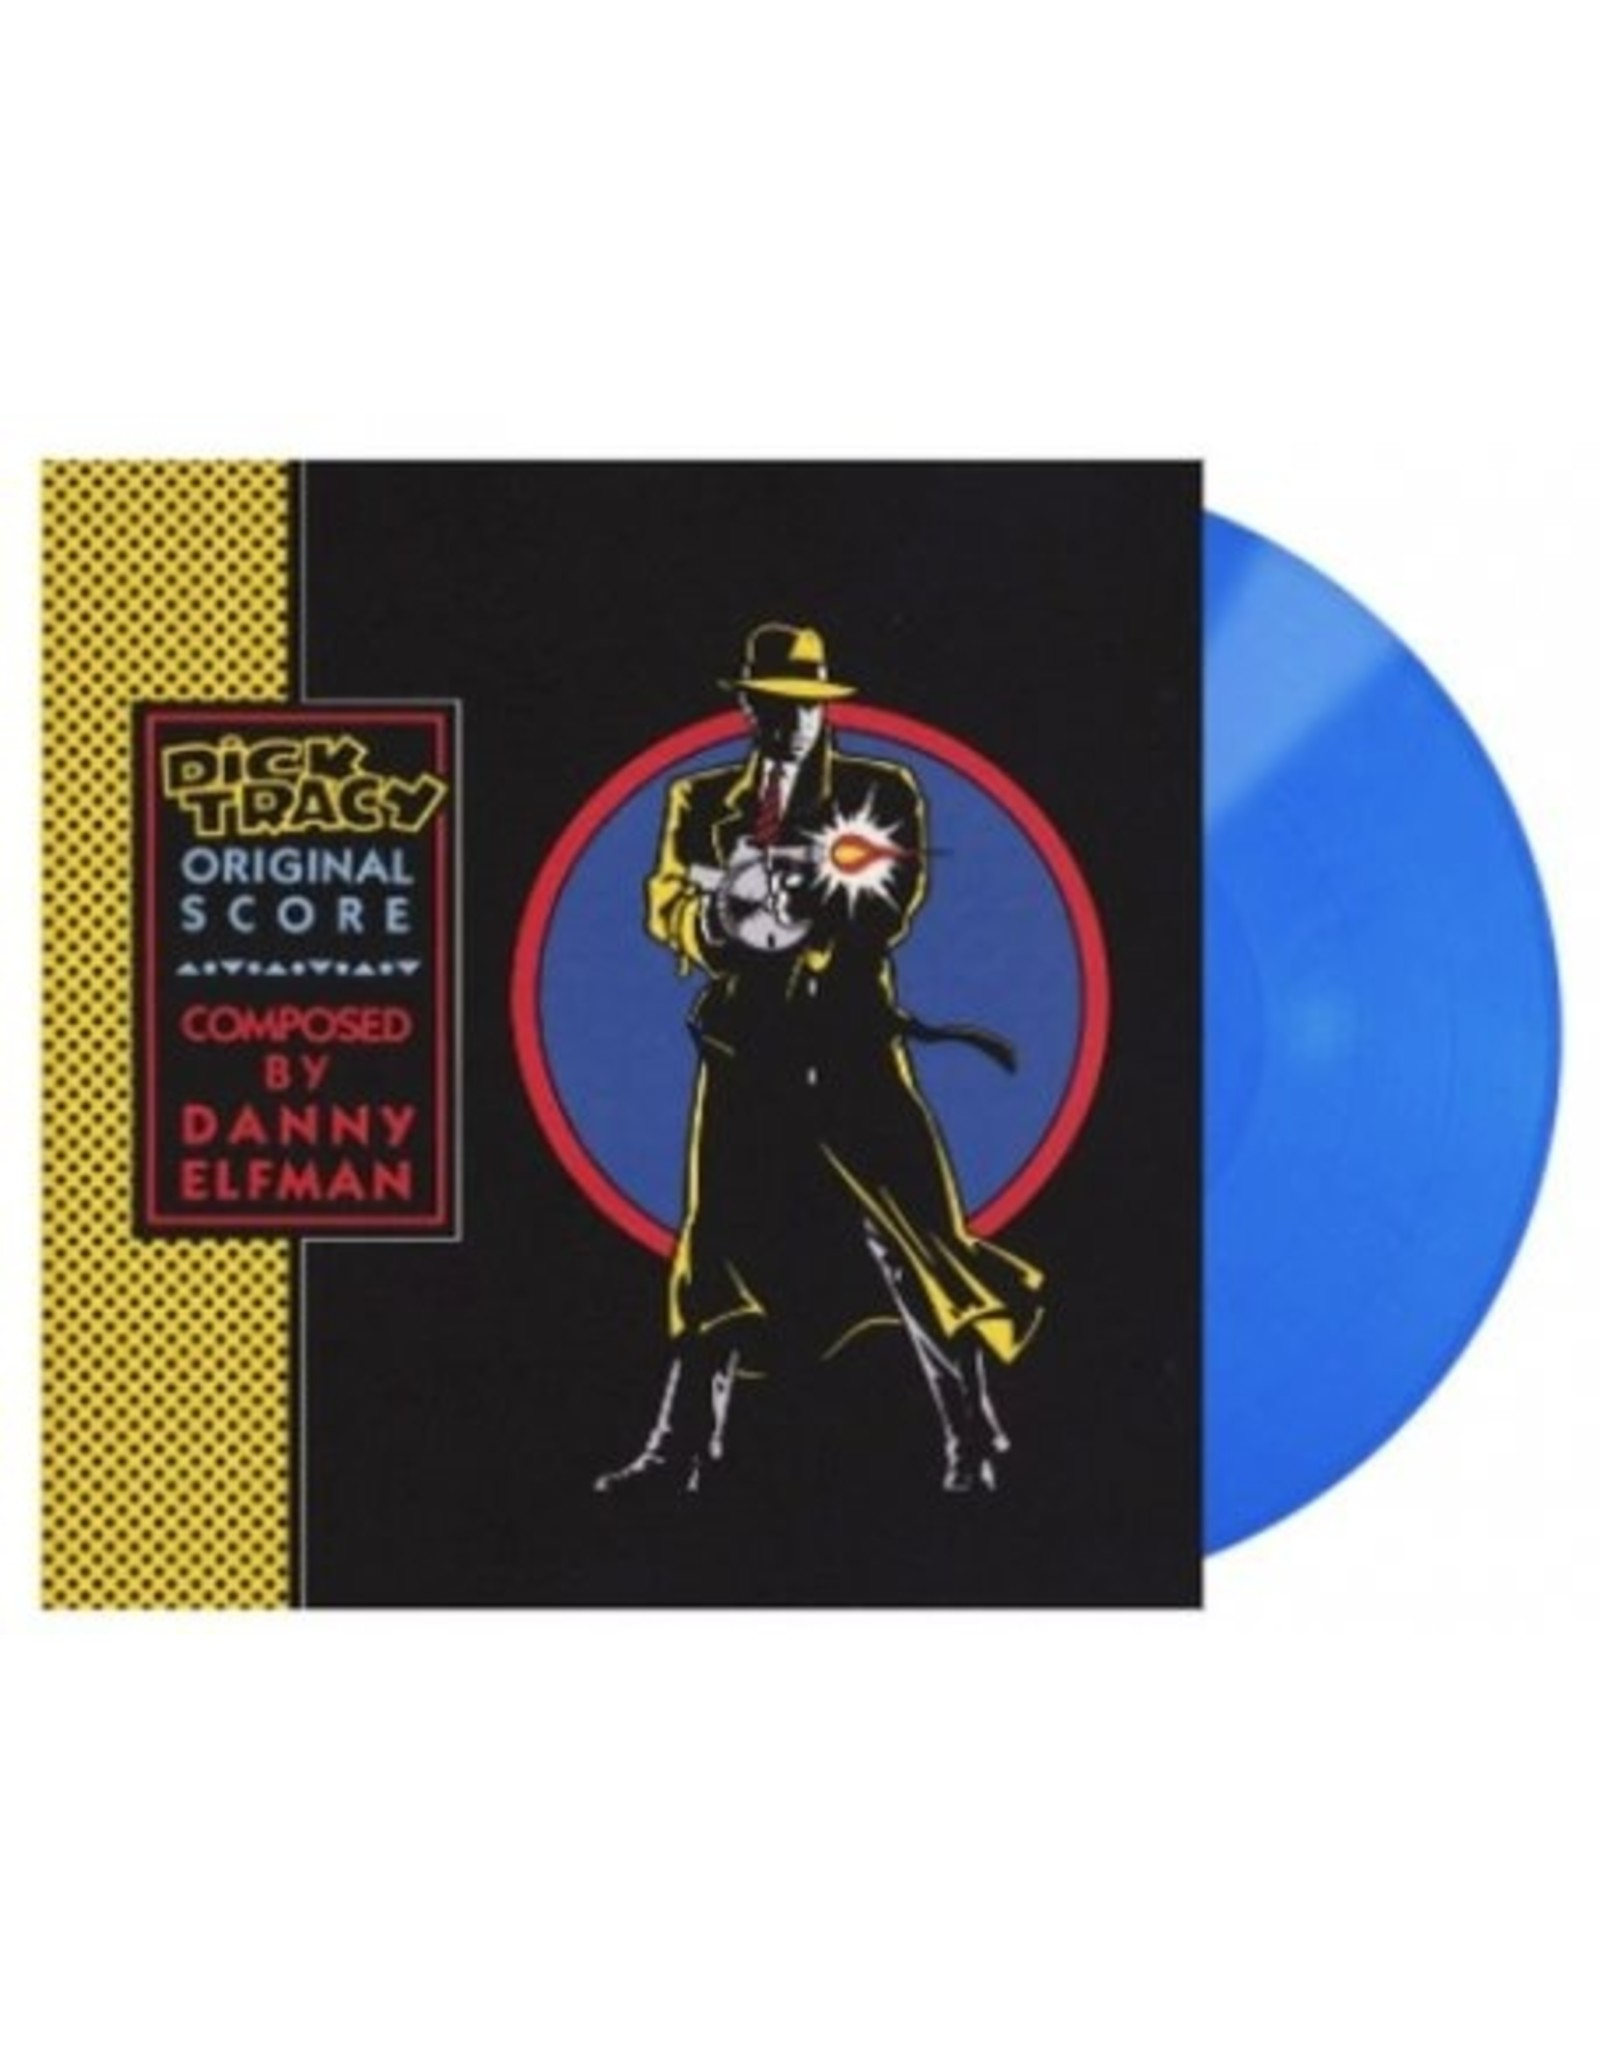 Danny Elfman - Dick Tracy (Original Score) [Exclusive Blue Vinyl]